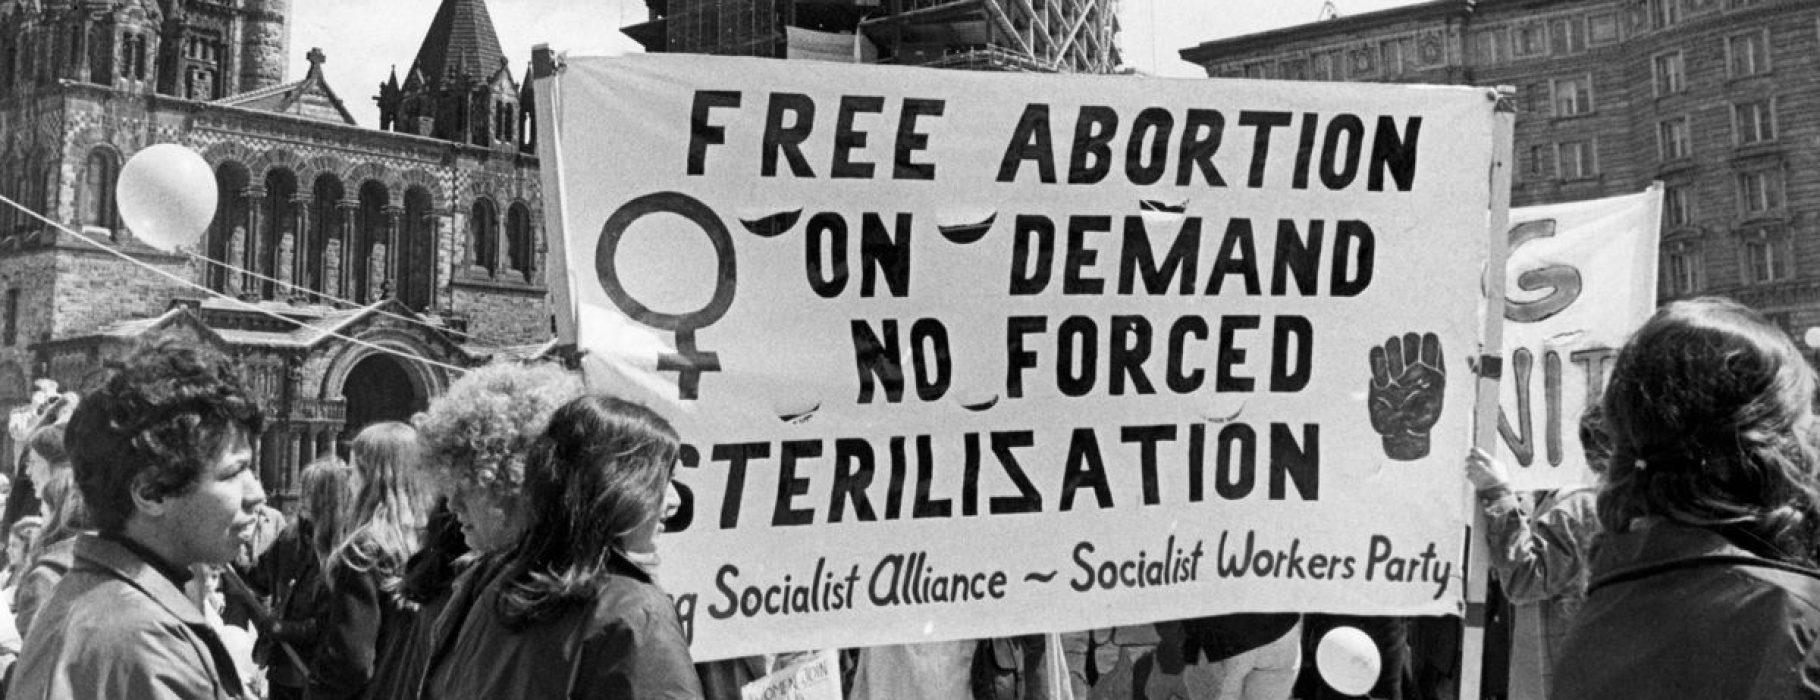 swp abortion